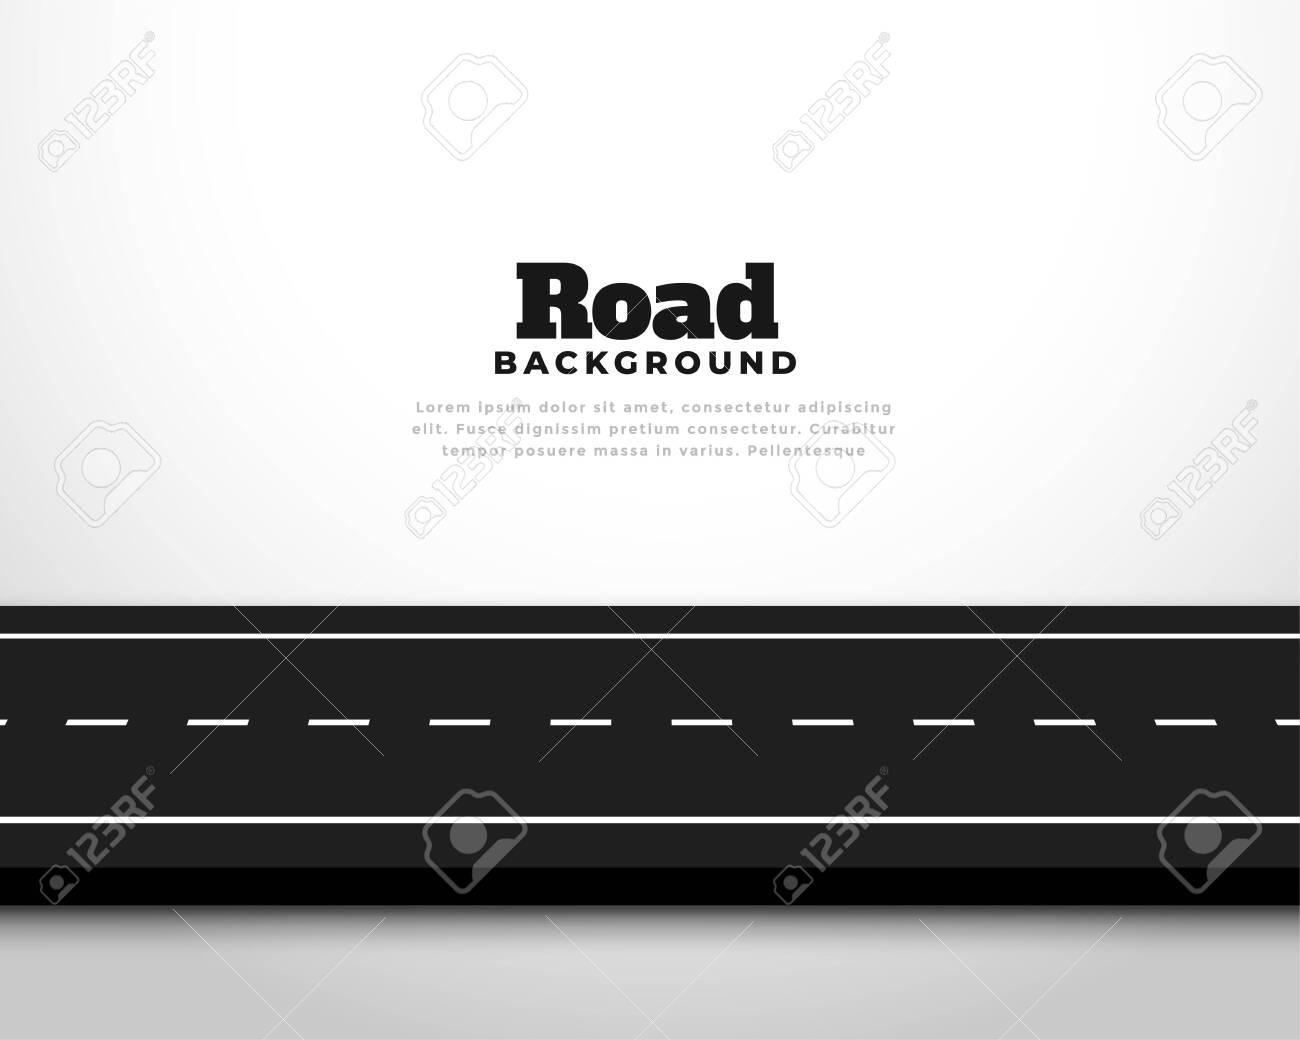 straight horizontal asphalt street road pathway background - 152978766